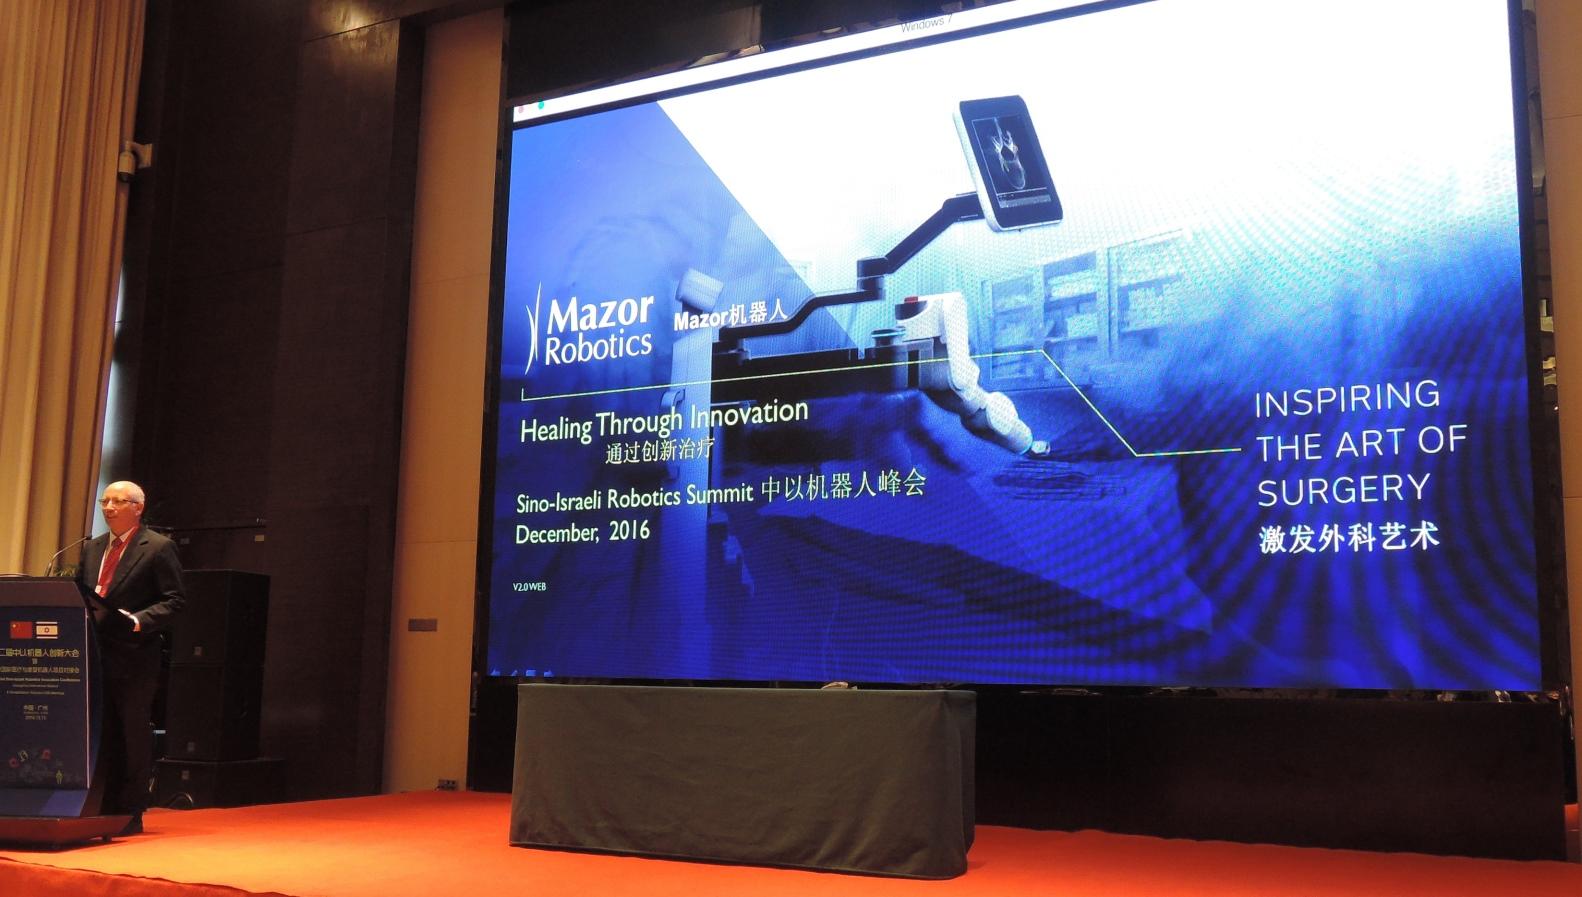 Prof. Moshe Shoham, founder of Mazor Robotics, addressing the Sino-Israeli Innovation Conference in China, December 2016. Photo: courtesy